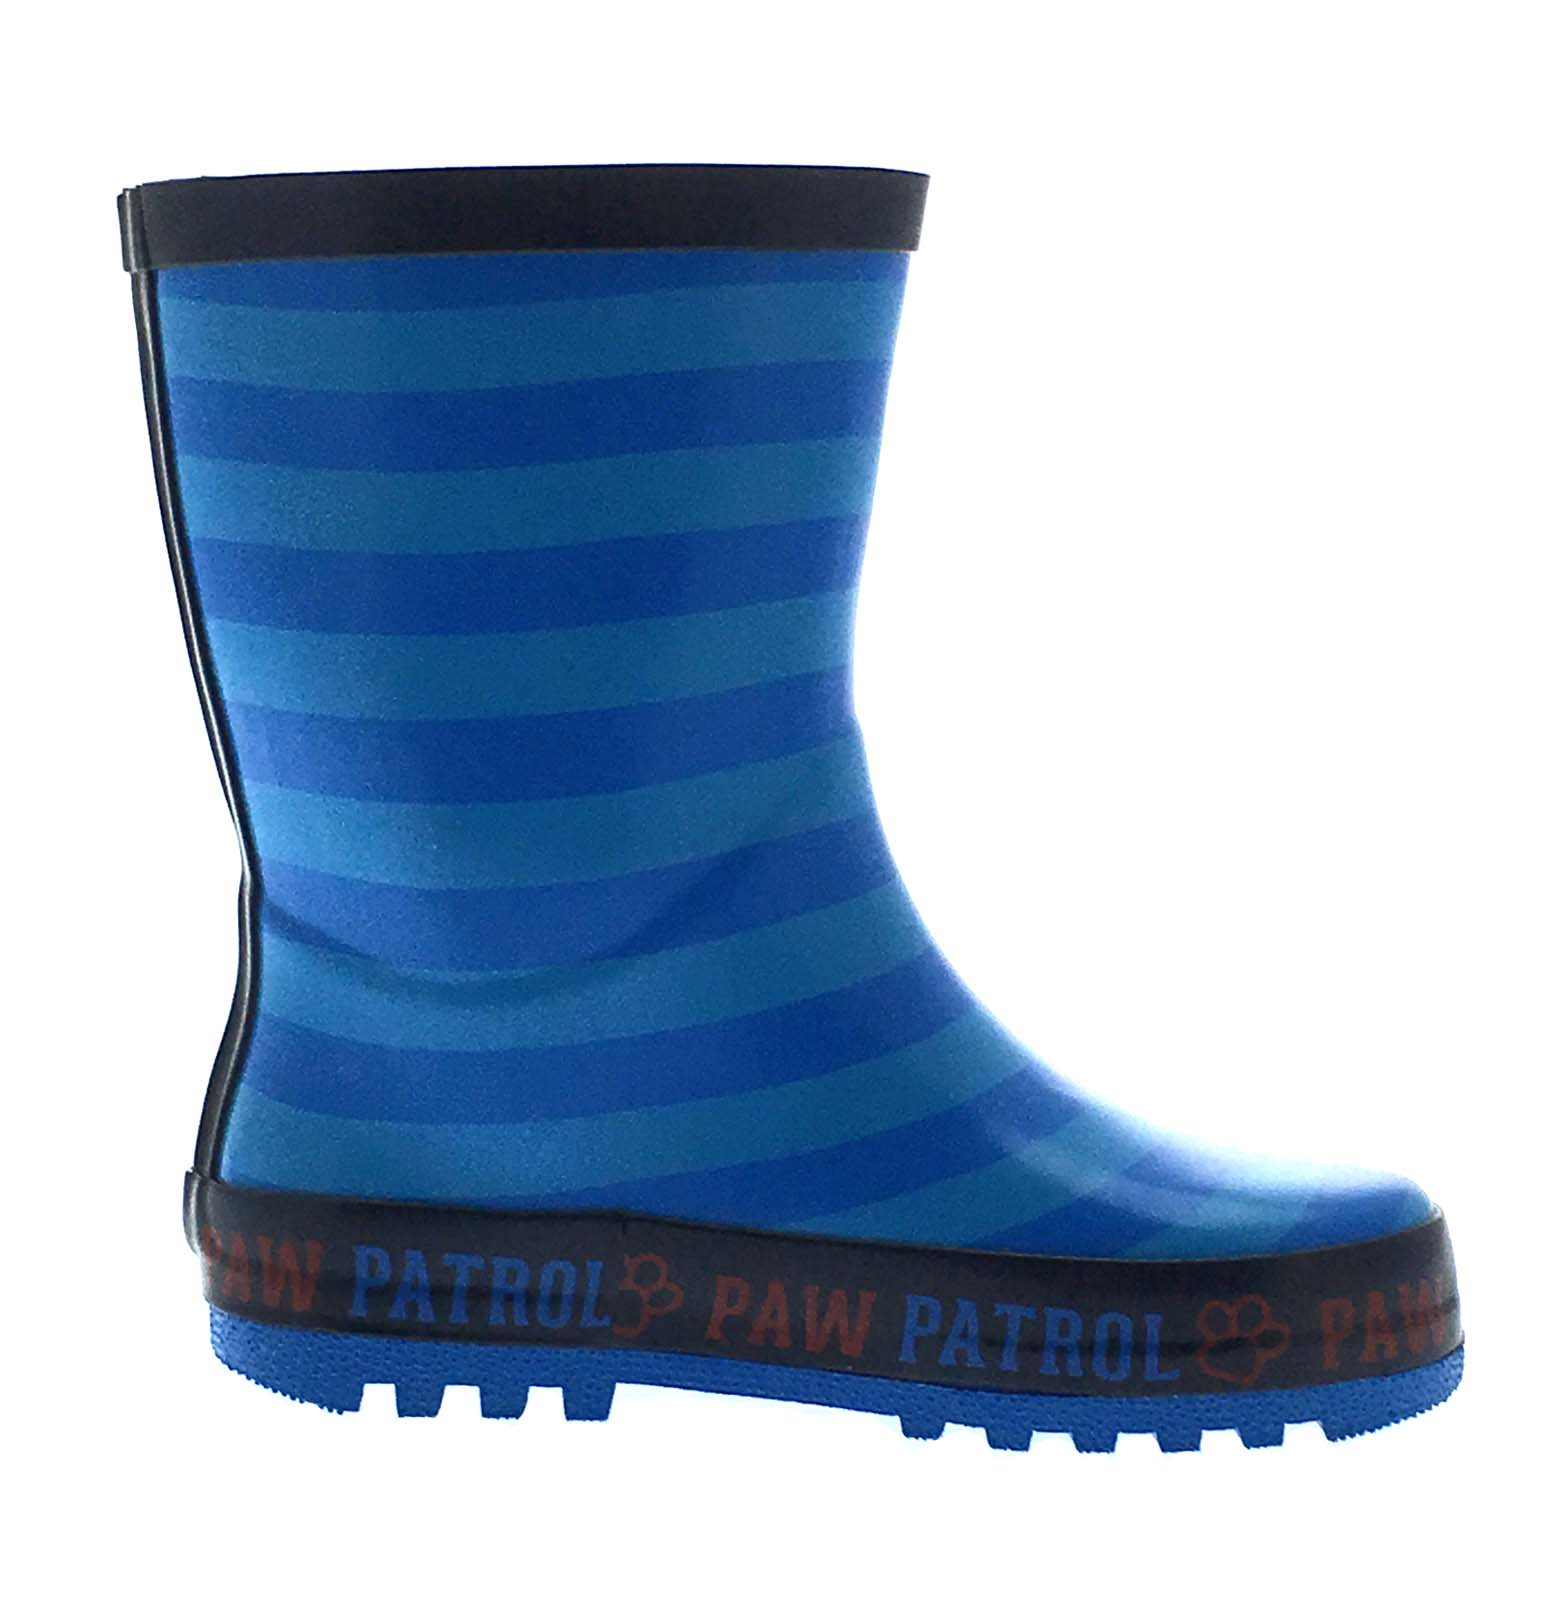 Boys Paw Patrol Wellington Boots Blue Rubber Rain Wellies